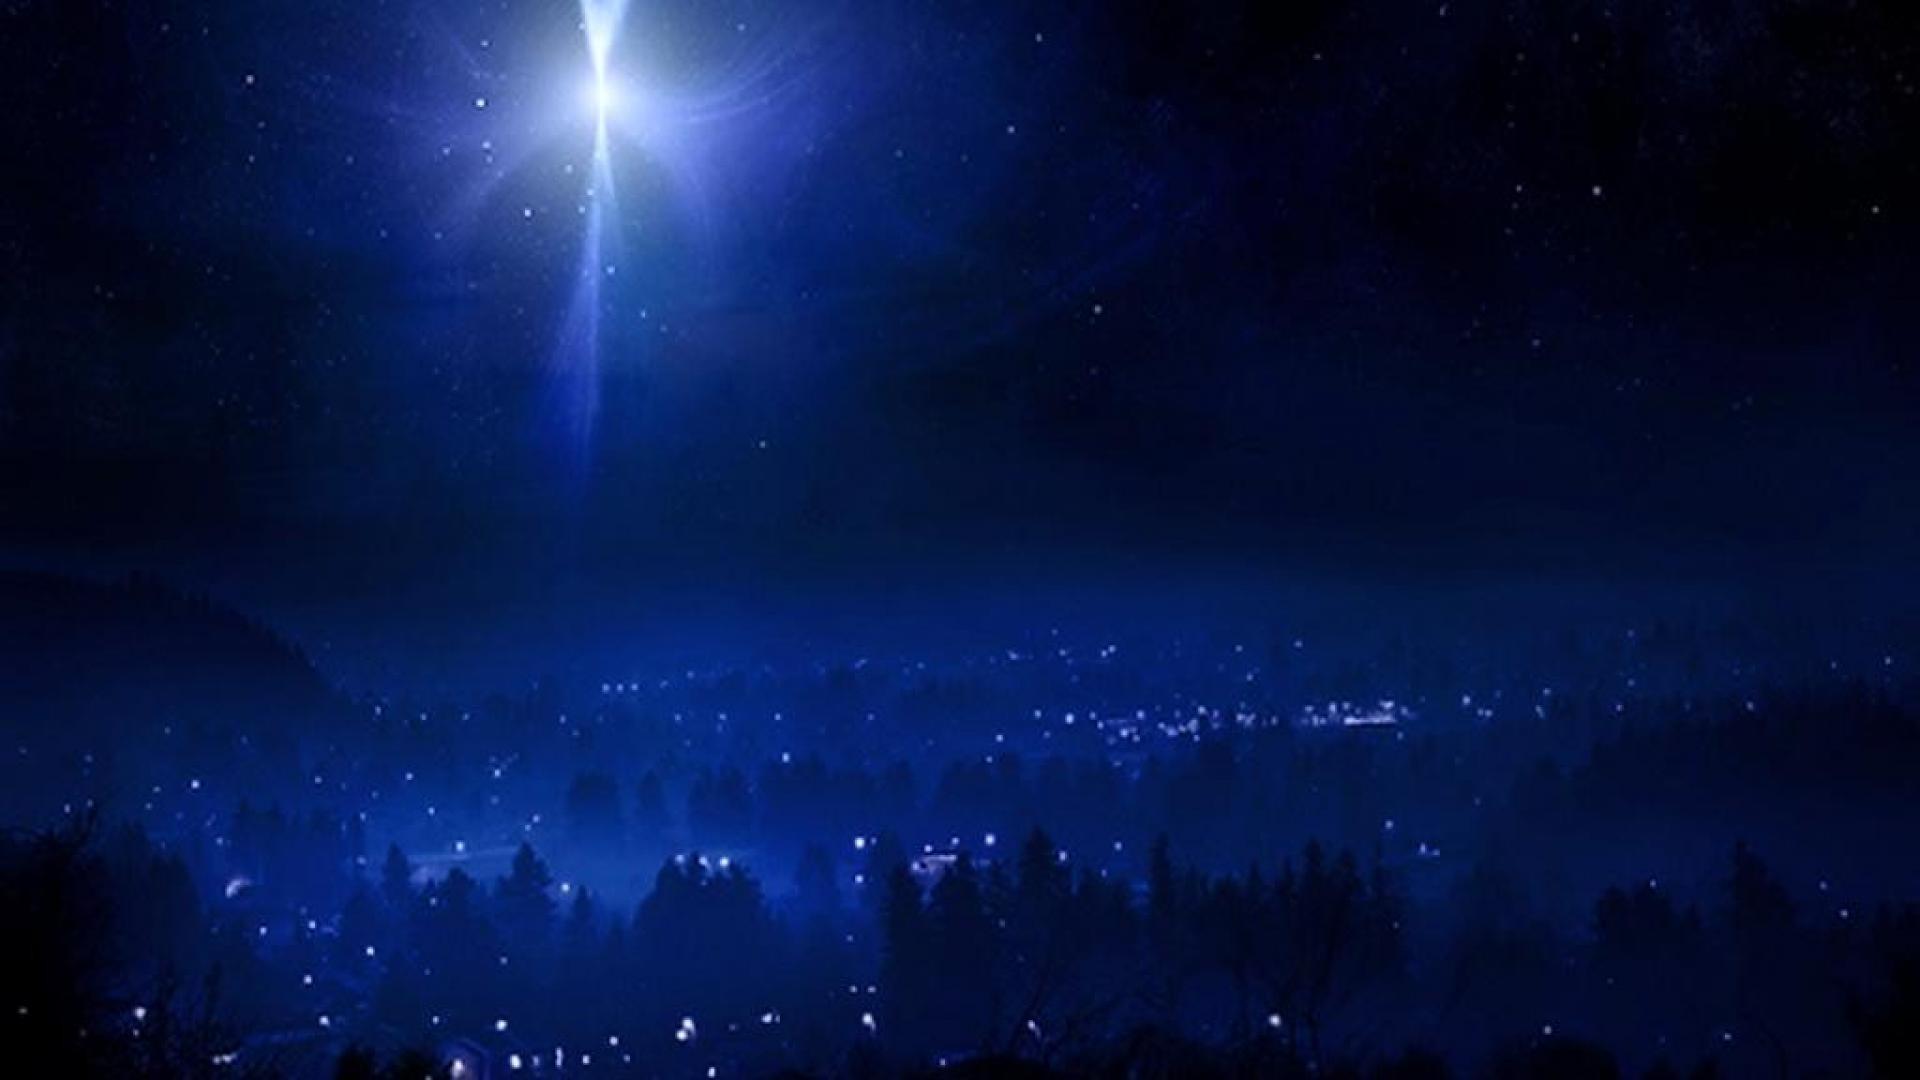 Fall Christian Wallpaper Christmas Star Background 183 ①